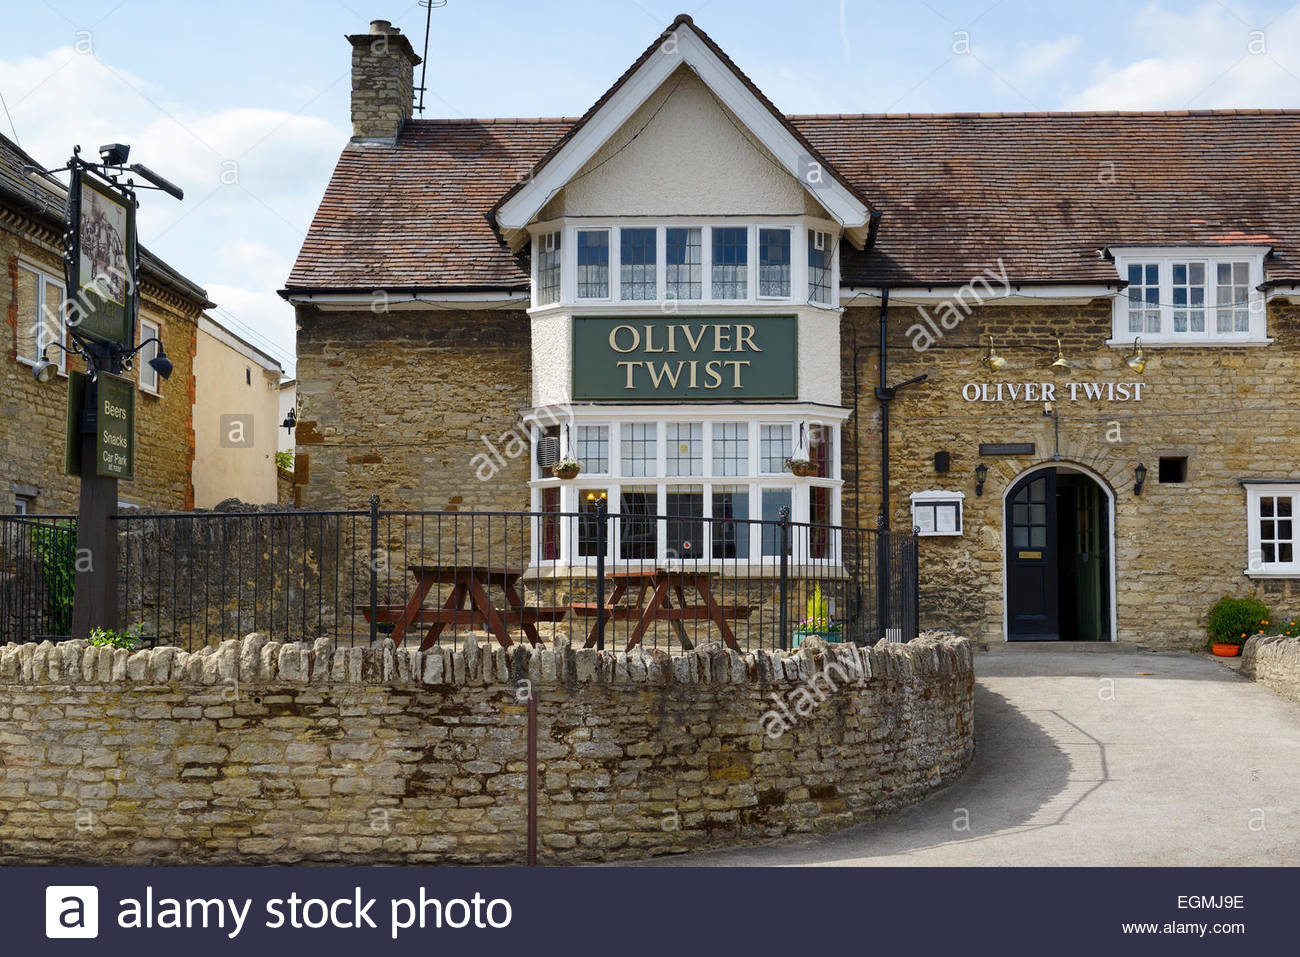 L'Oliver Twist pub, Irthlingborough Northamptonshire, Angleterre, Royaume-Uni Photo Stock